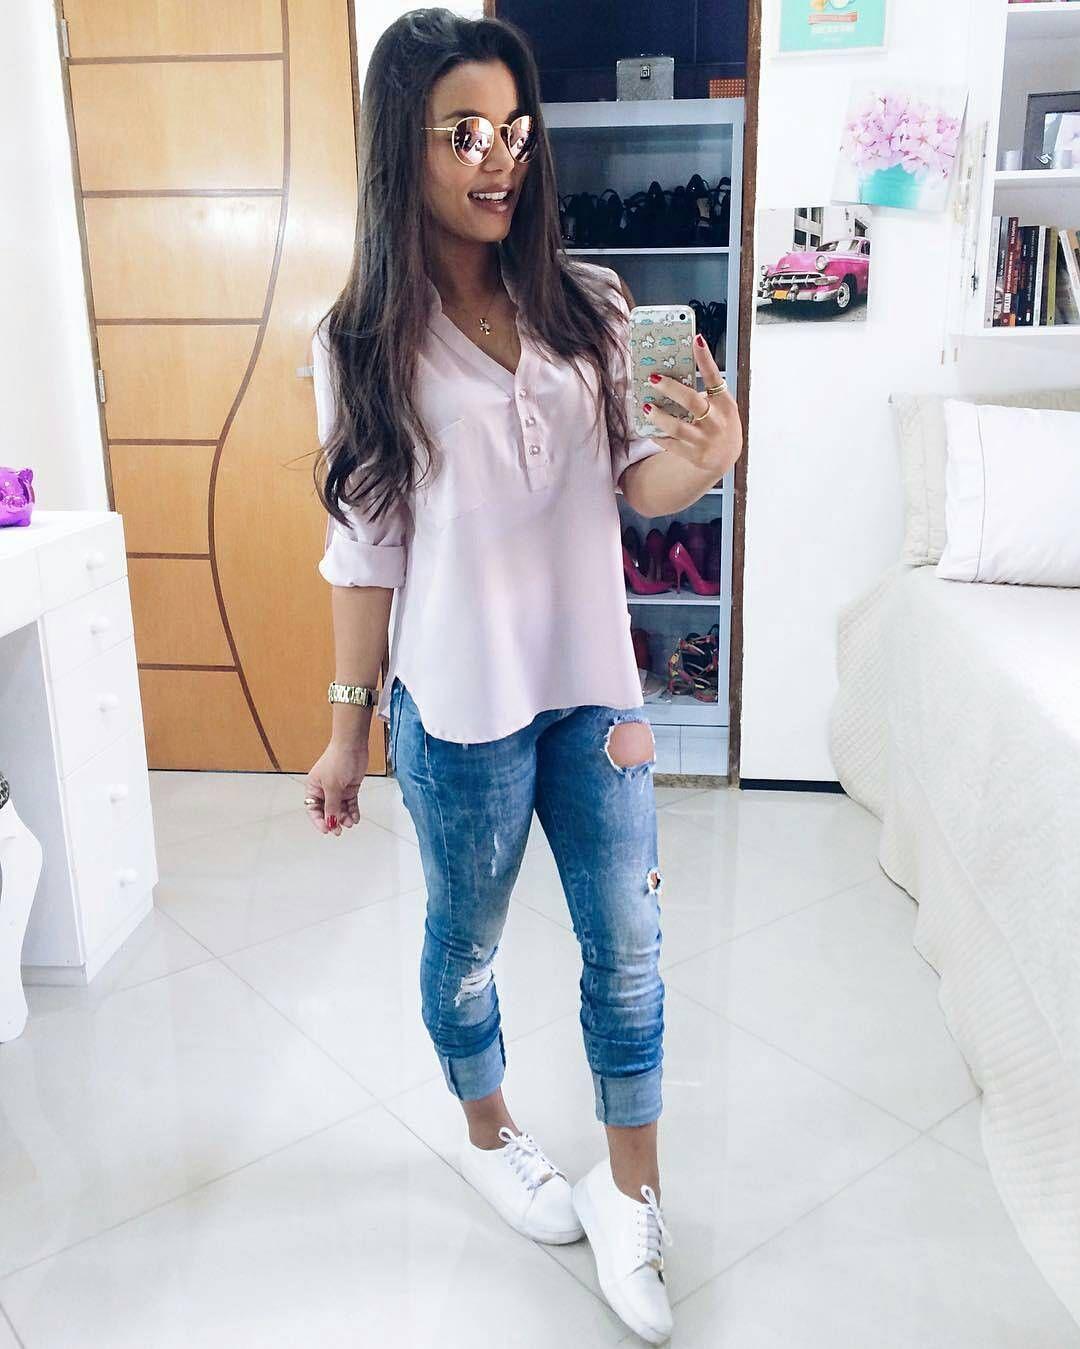 Populares Moda Tumblr Girls (@modatumblrgirls) • Fotos y vídeos de Instagram  UA71